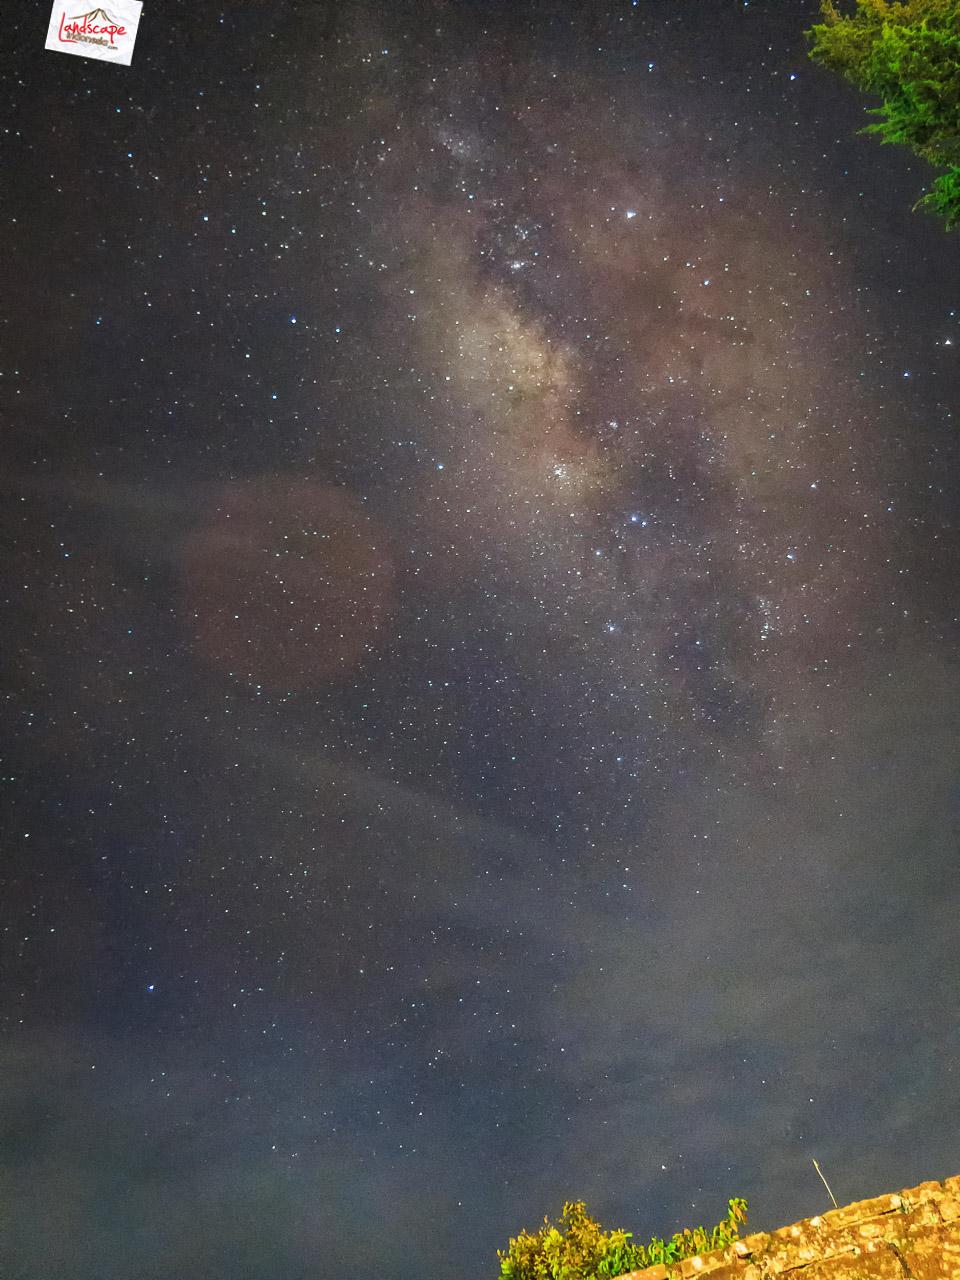 milkyway kamera poket 1 - Memotret Milky Way dengan Kamera Poket